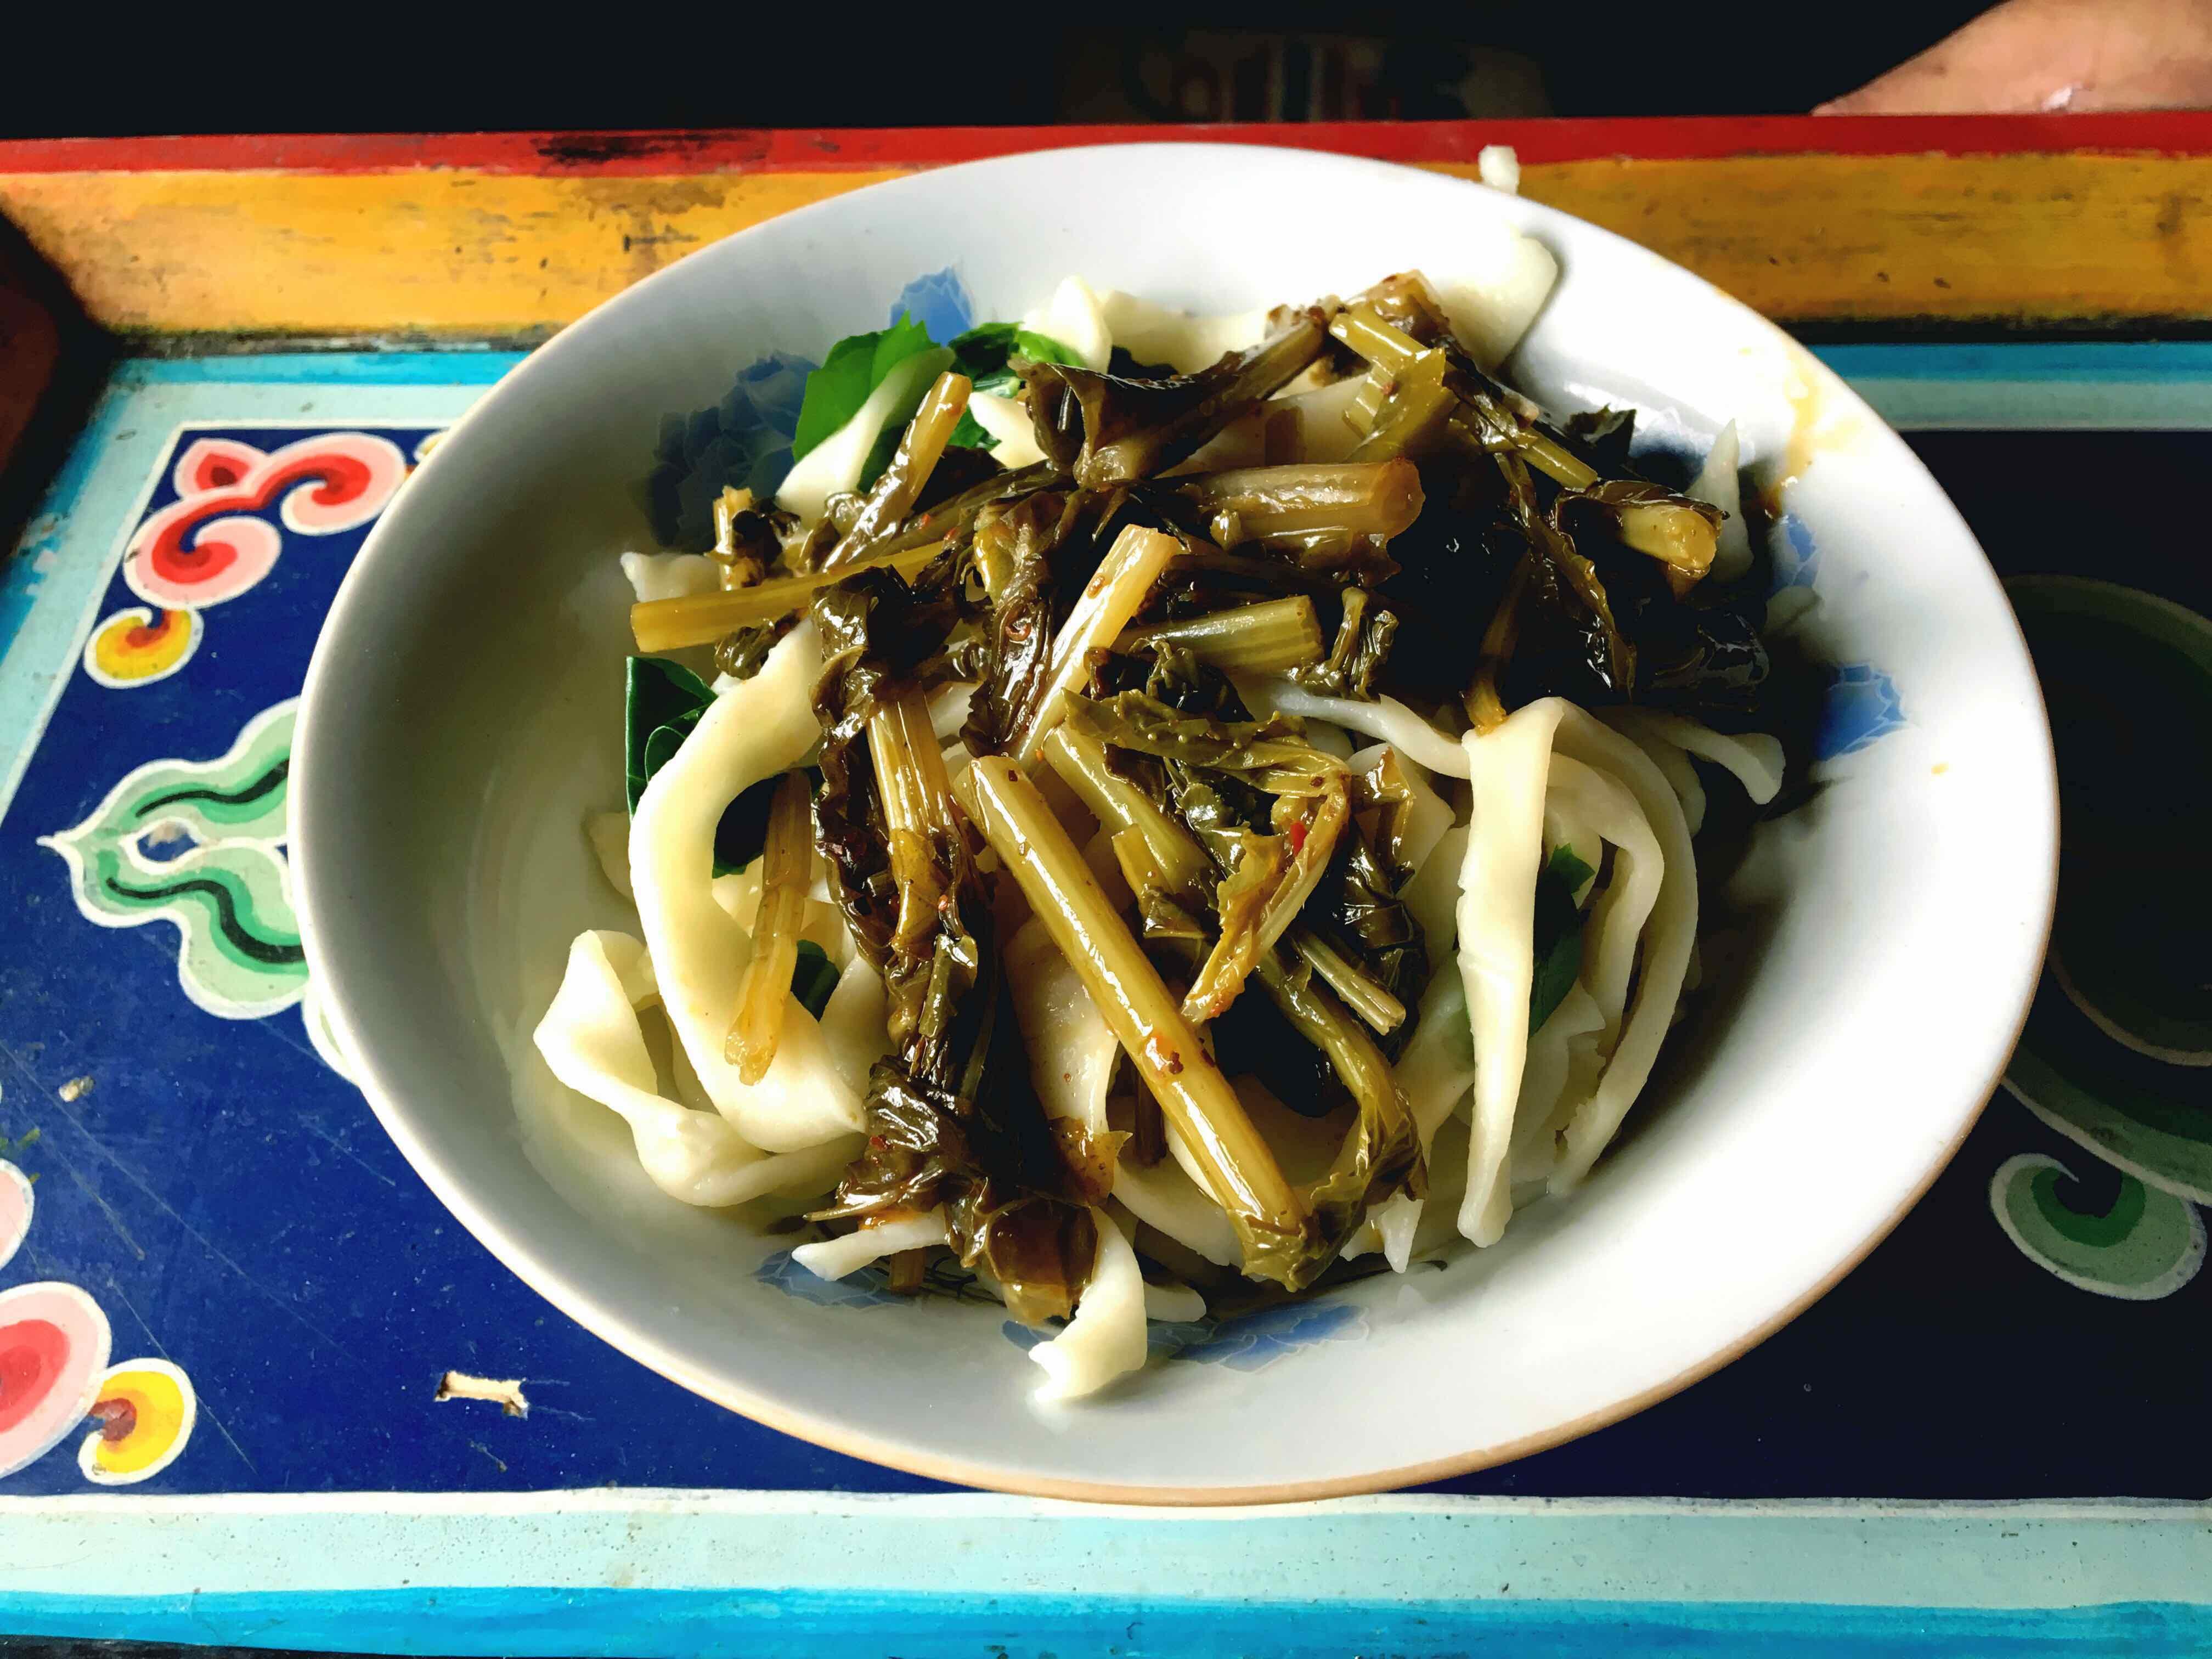 Local Tibetan noodle at Zang Yuan Qing Tibetan Restaurant